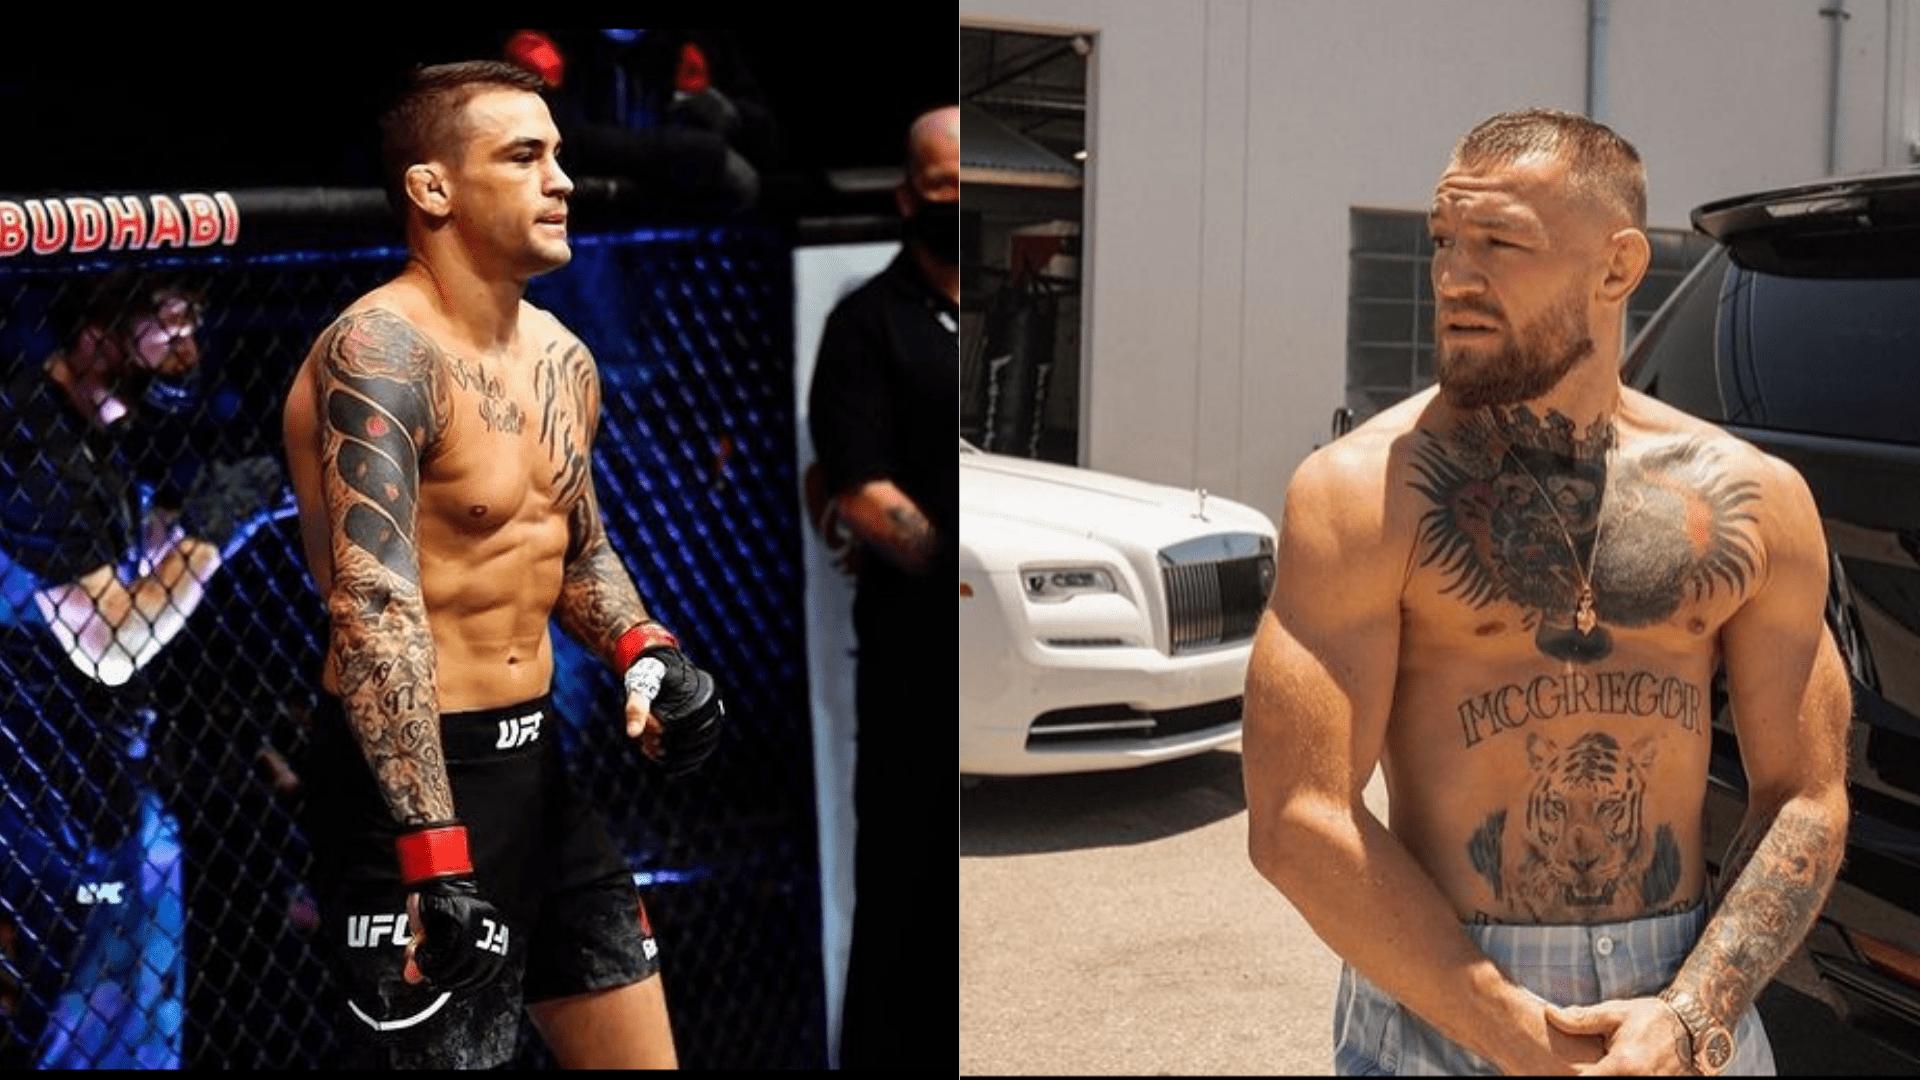 UFC 264, Dustin Poirier and Conor McGregor